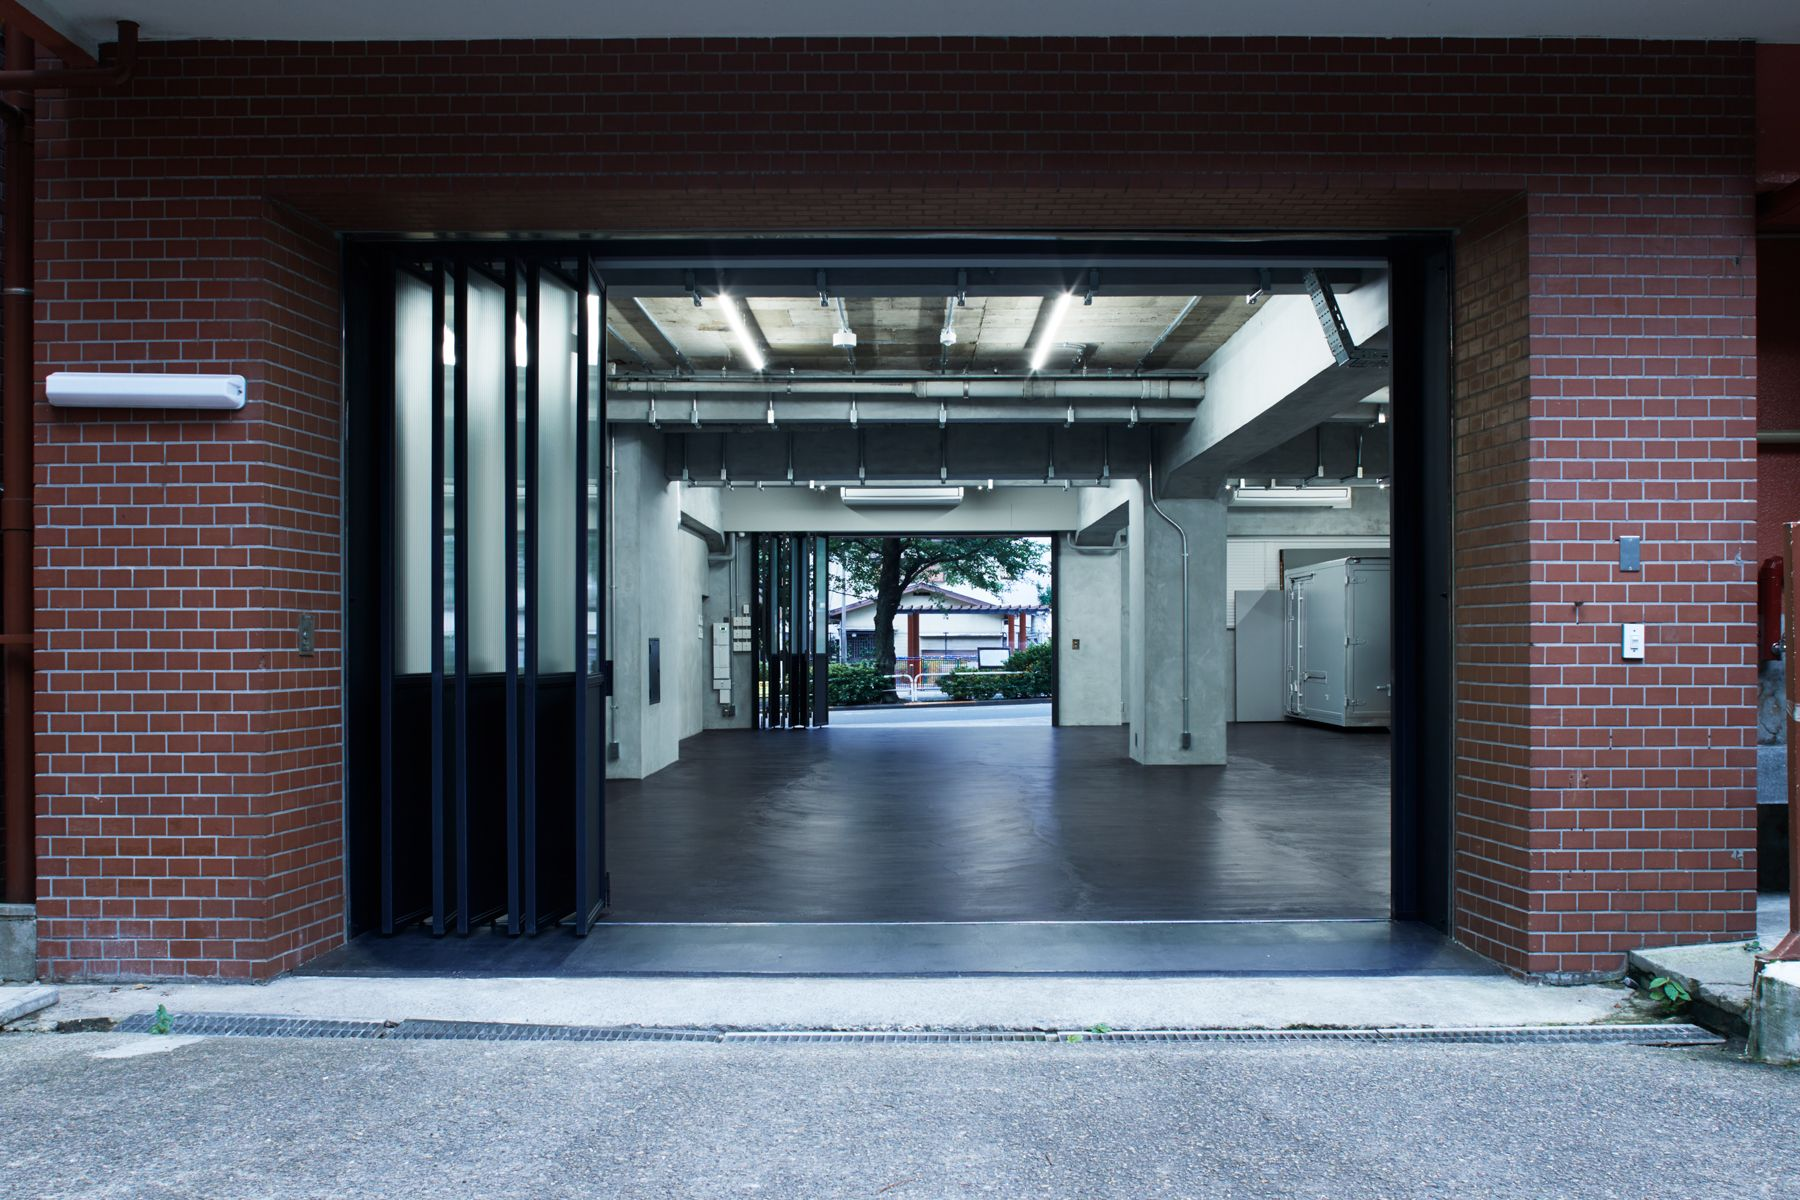 noru studio (ノル スタジオ)換気もしやすい設計